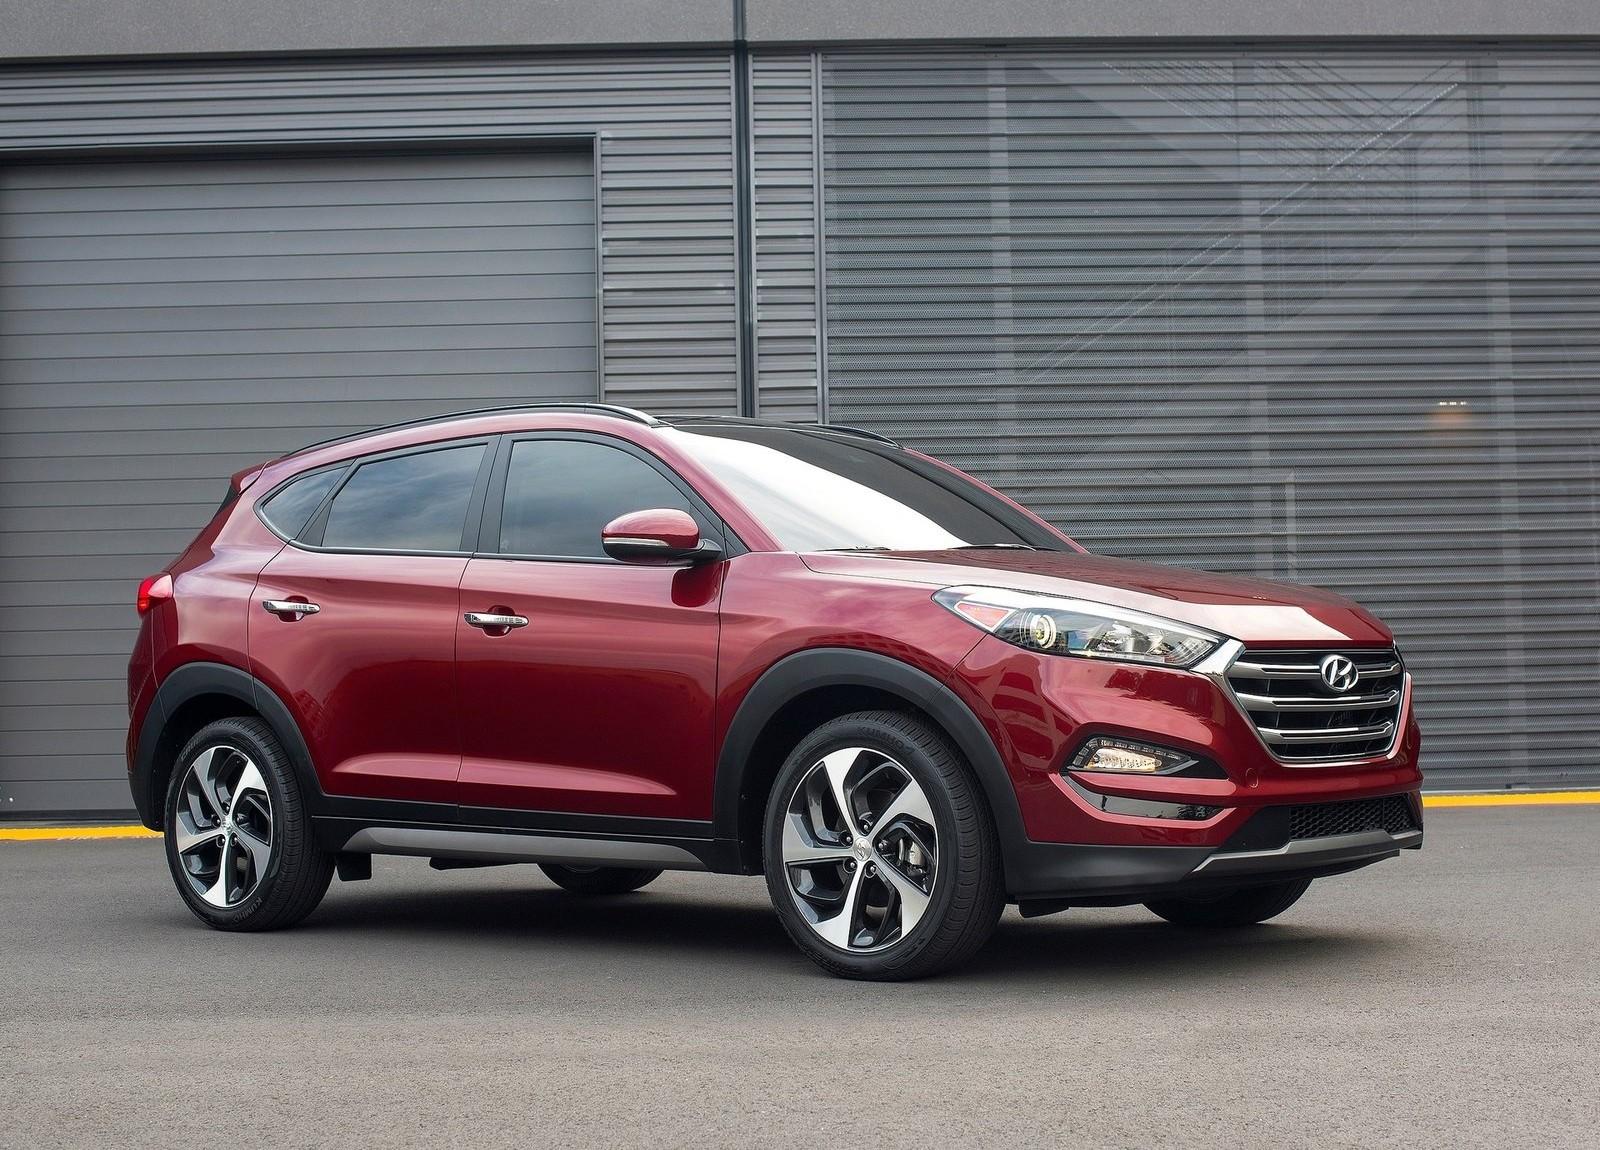 tucson quarter lease deals drive leasing estate hire front gdi nav blue car three contract se hyundai